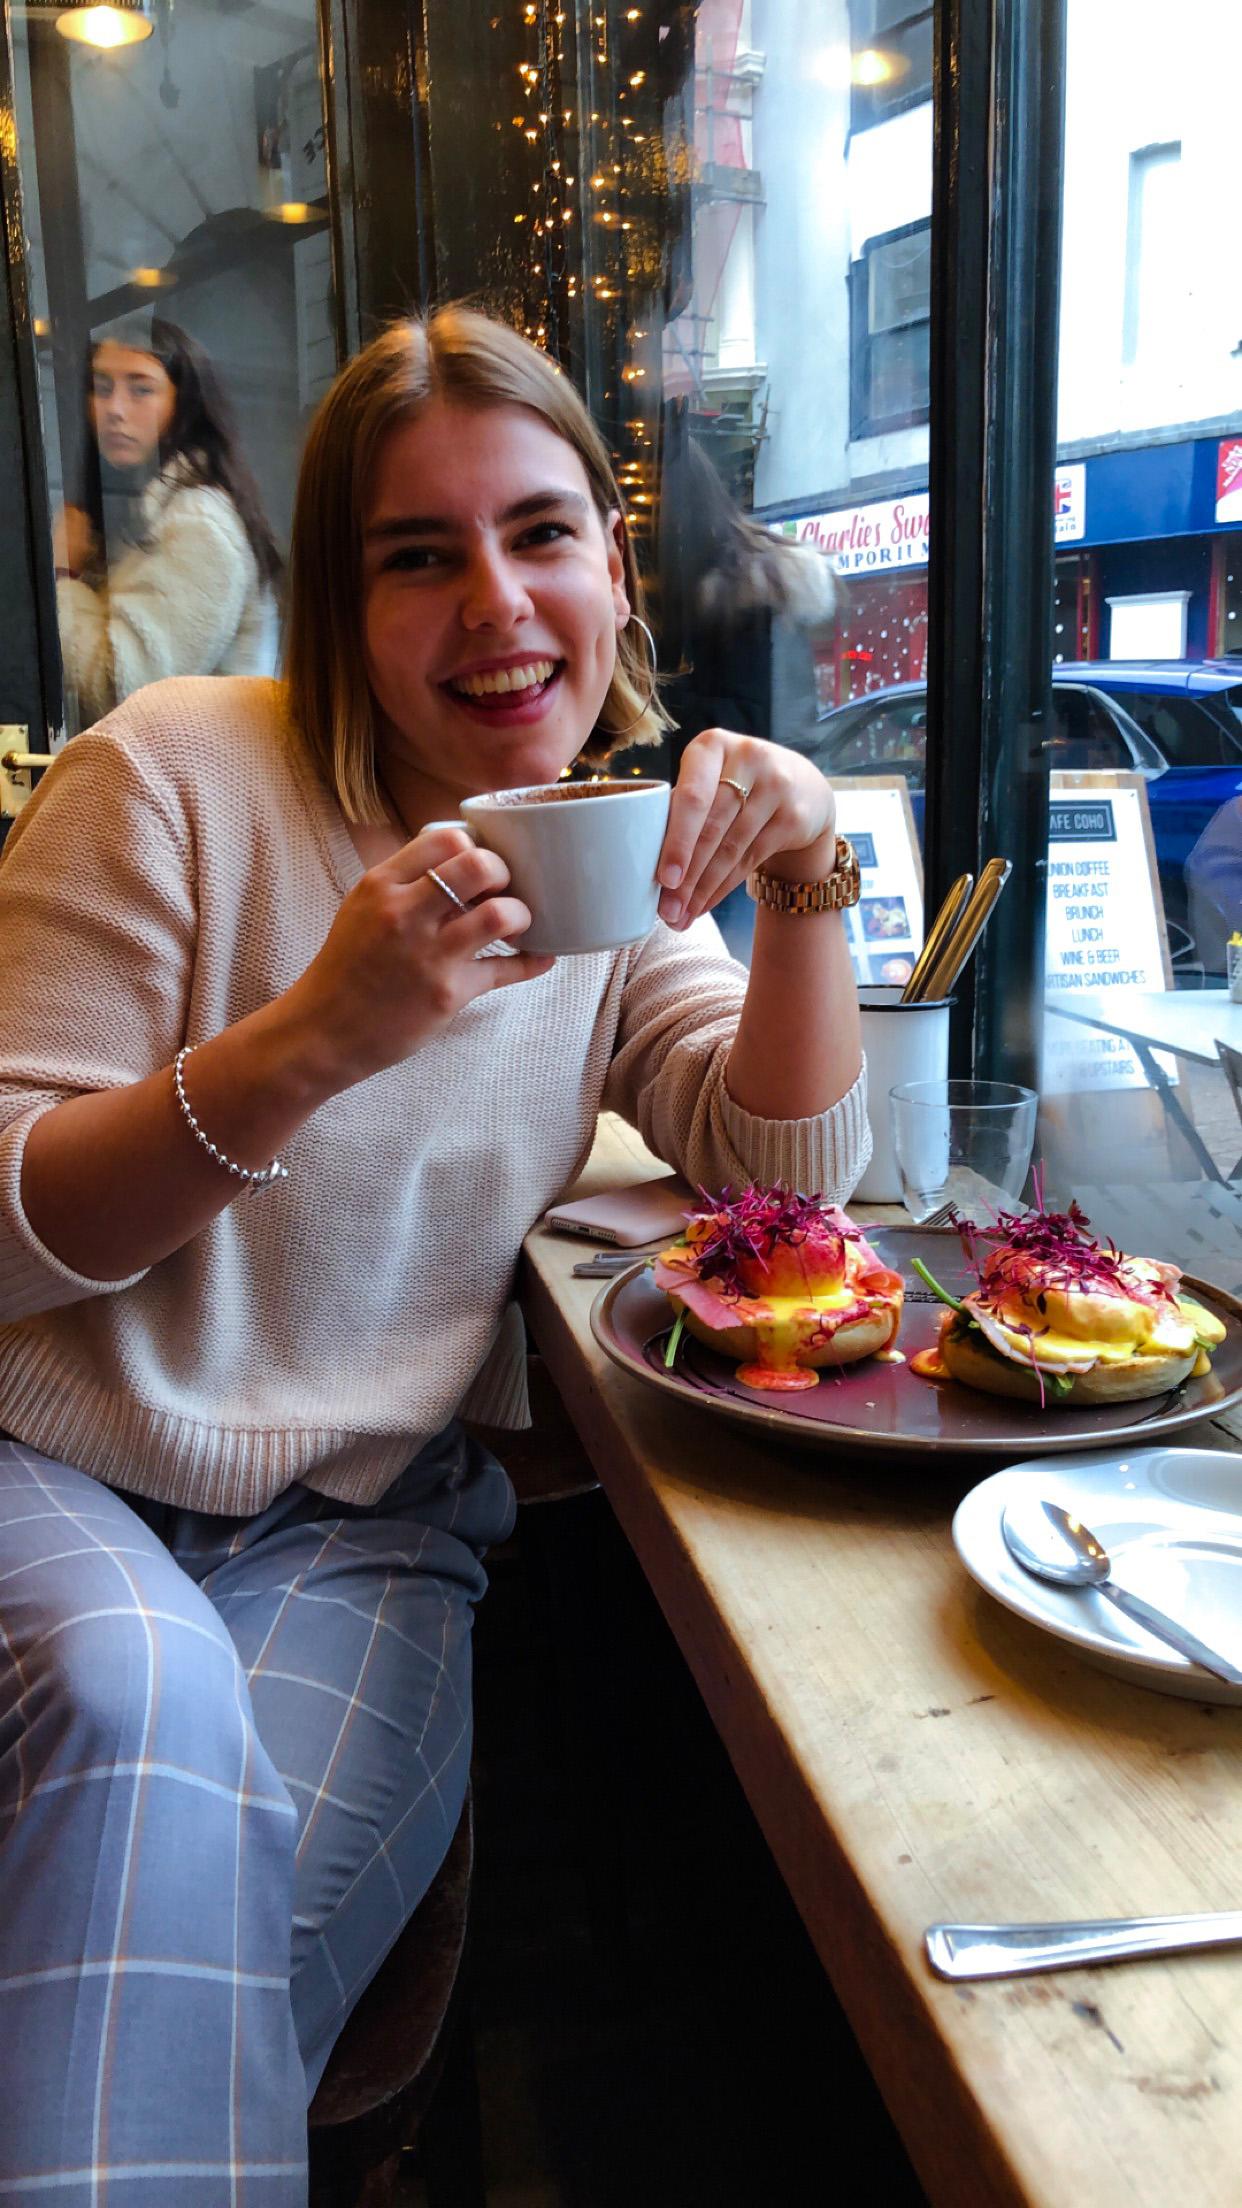 yasmin stefanie jenni roberts brighton hove brunch cafe coho